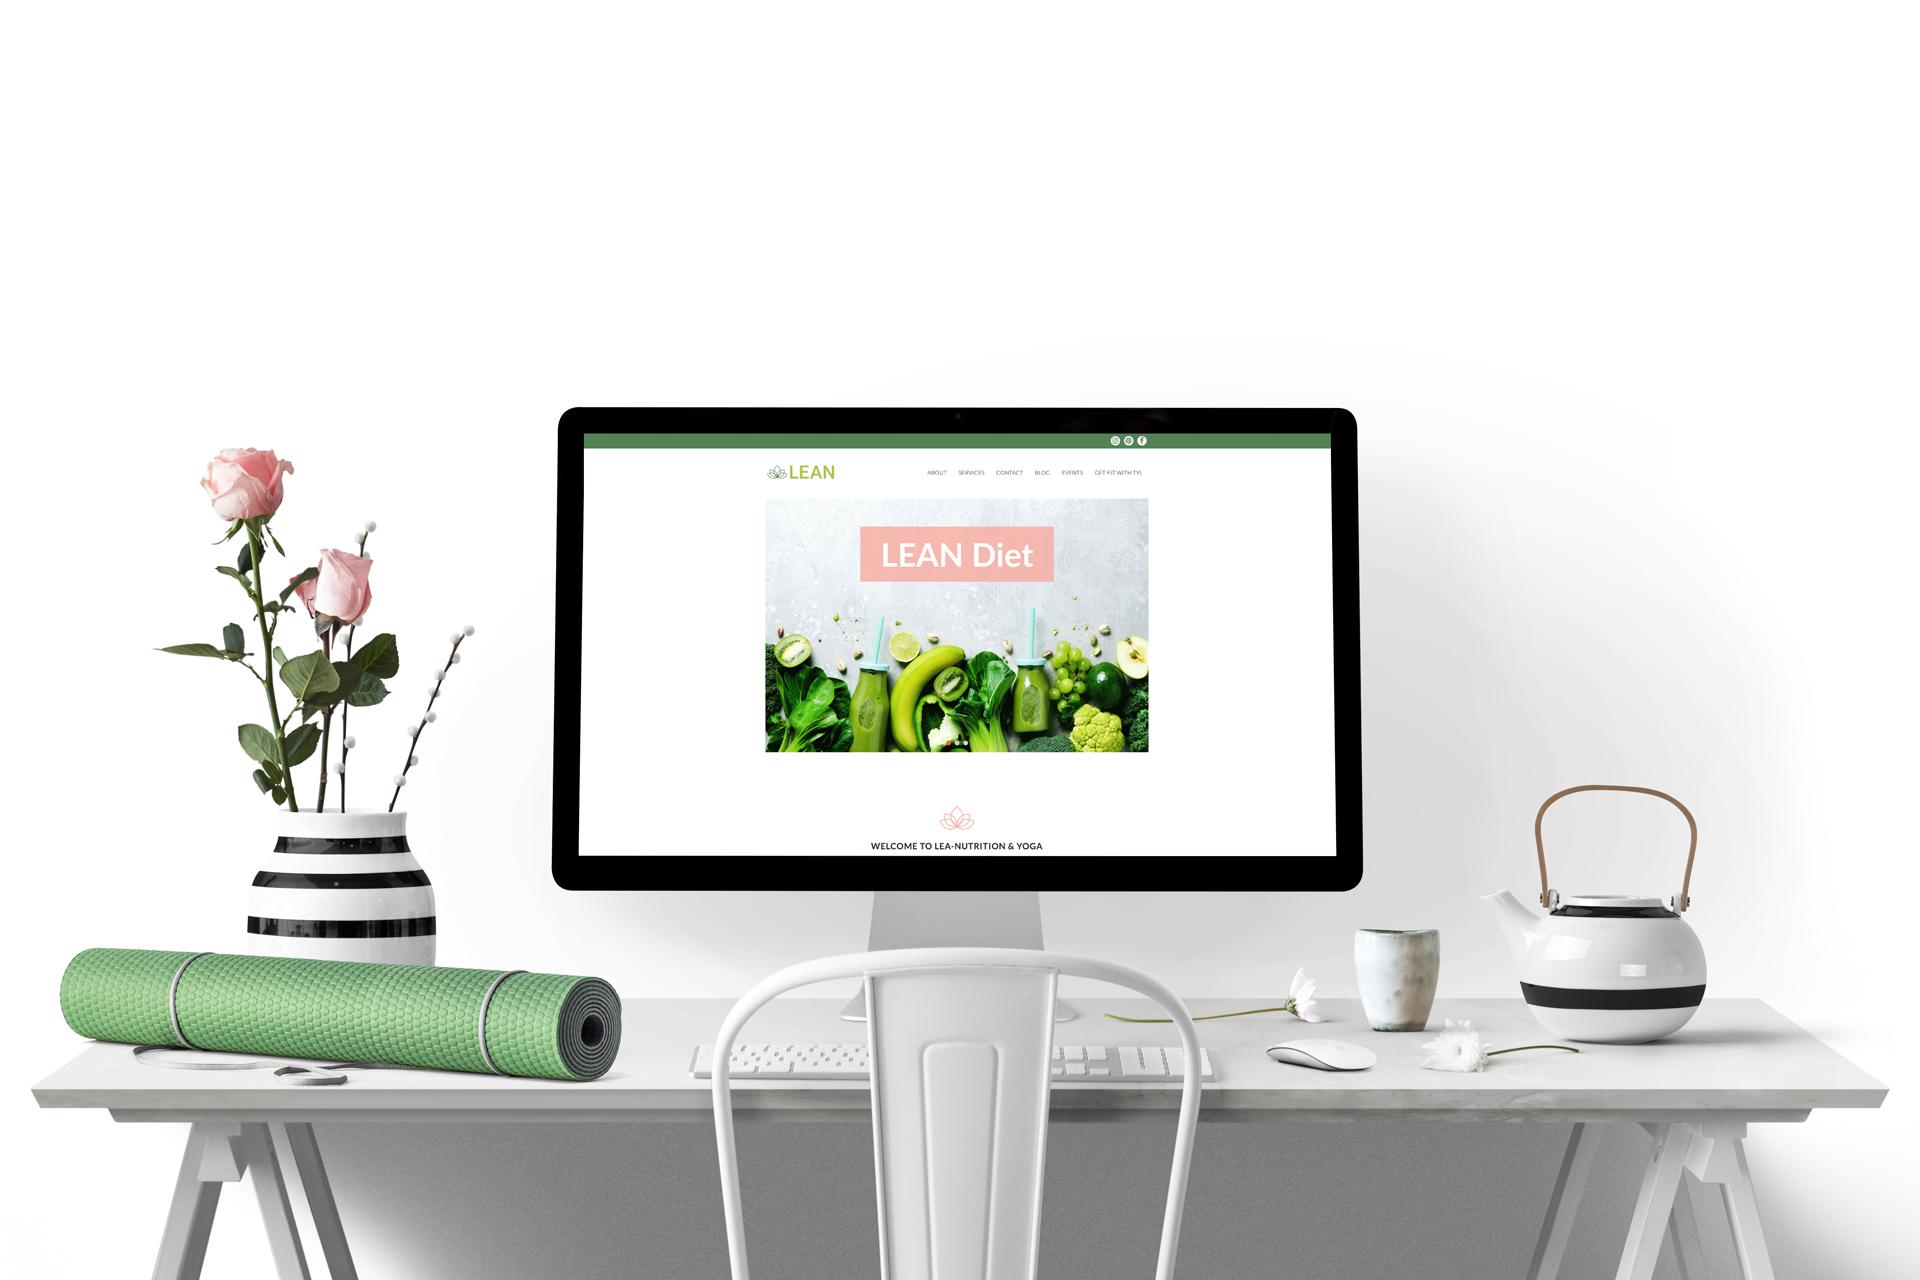 Lean Website Mockup Desk Flowers Yoga Mat